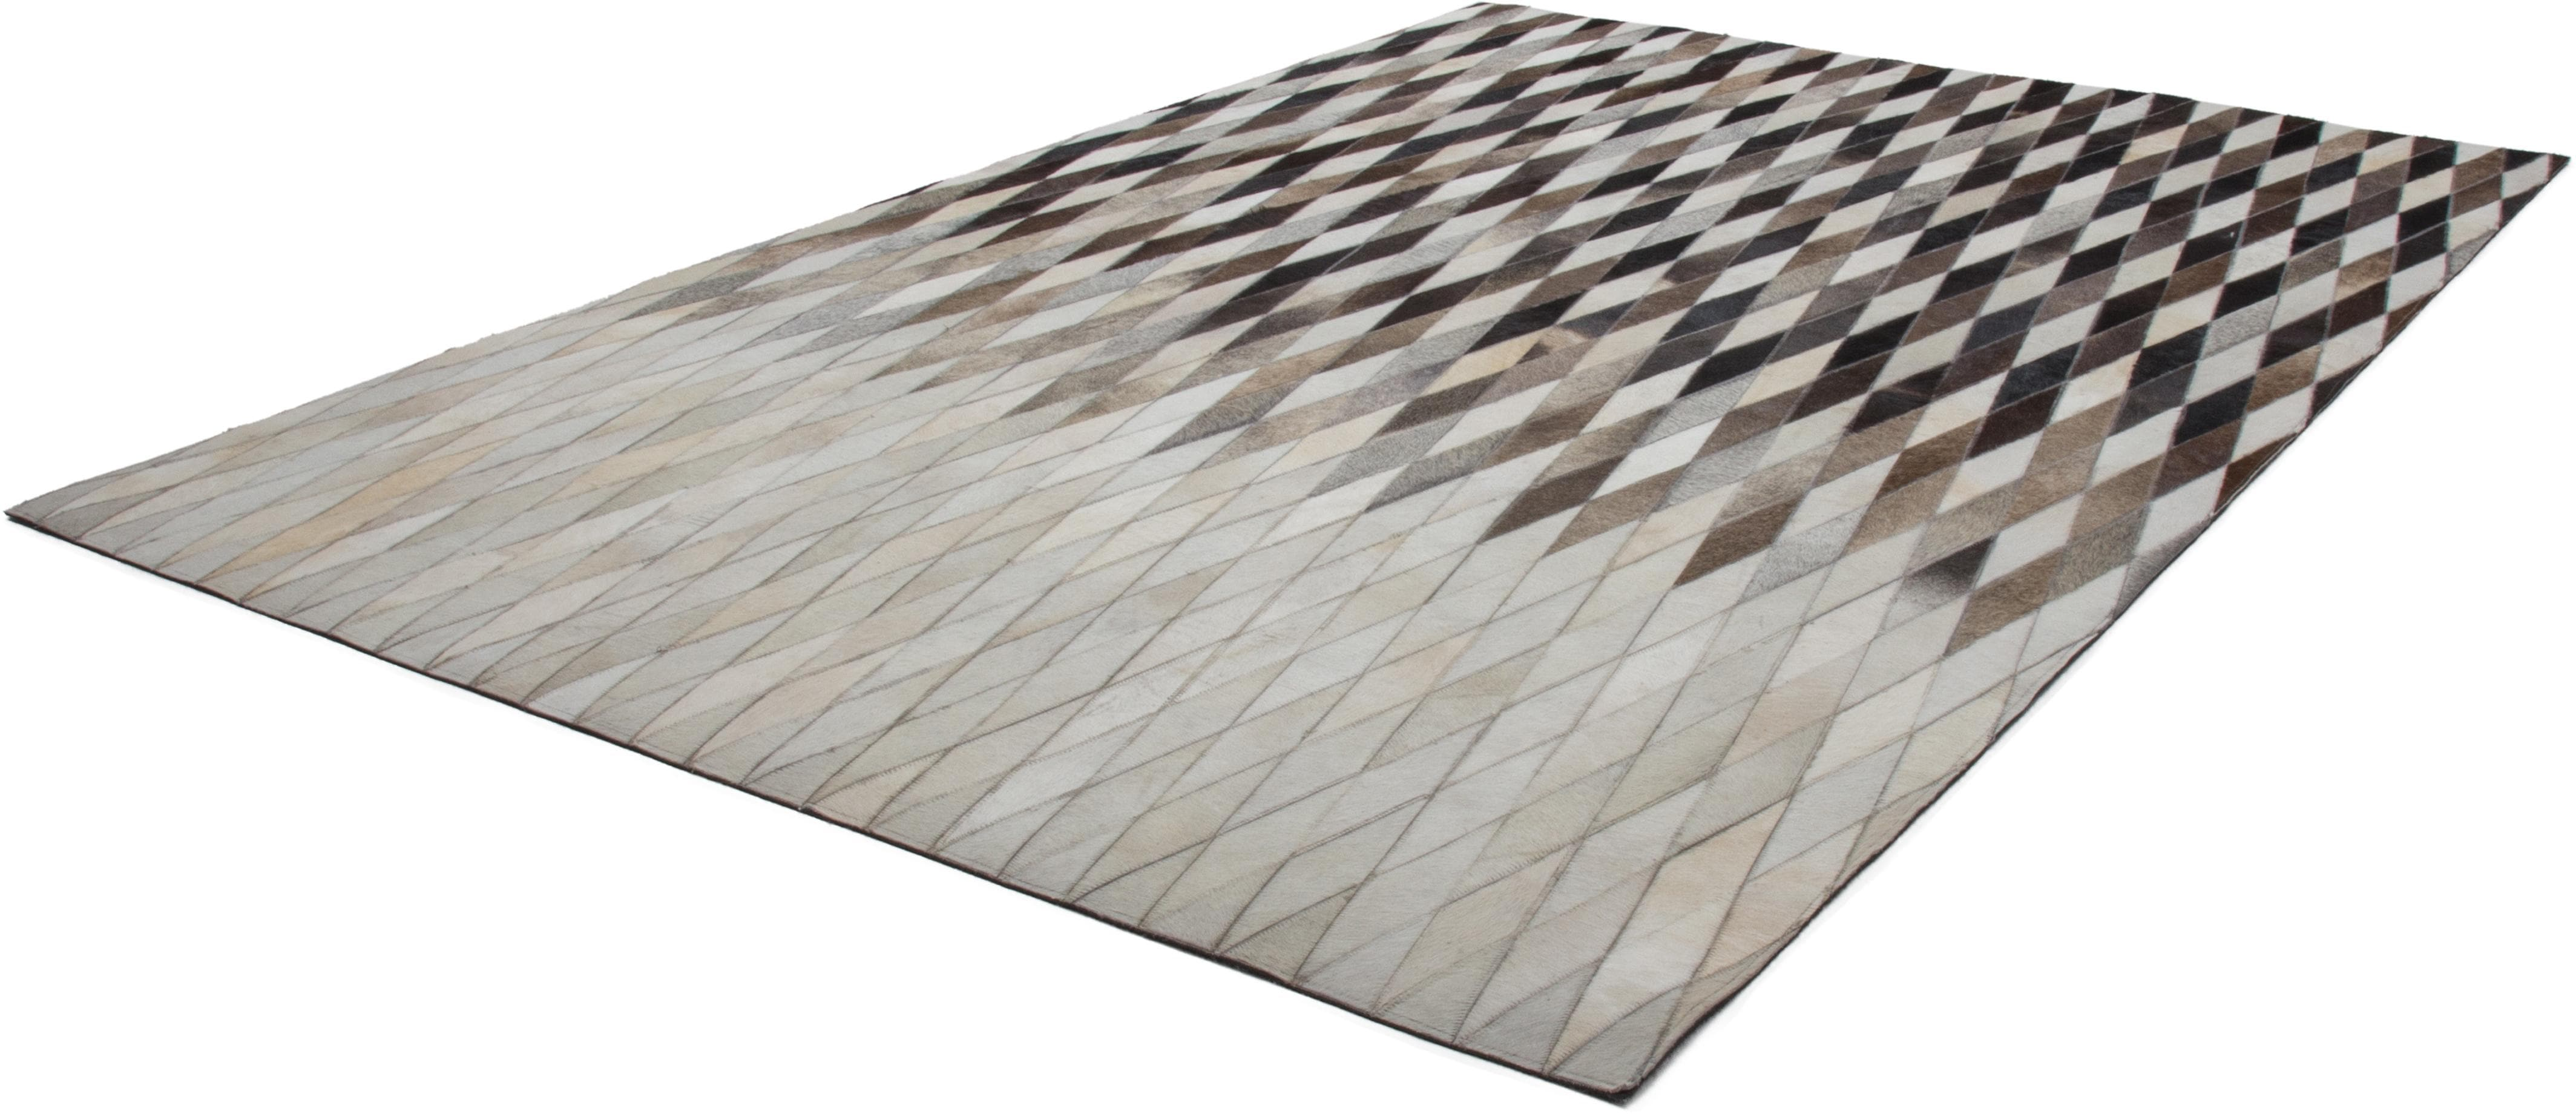 Fellteppich Lavish 510 Kayoom rechteckig Höhe 8 mm handgewebt